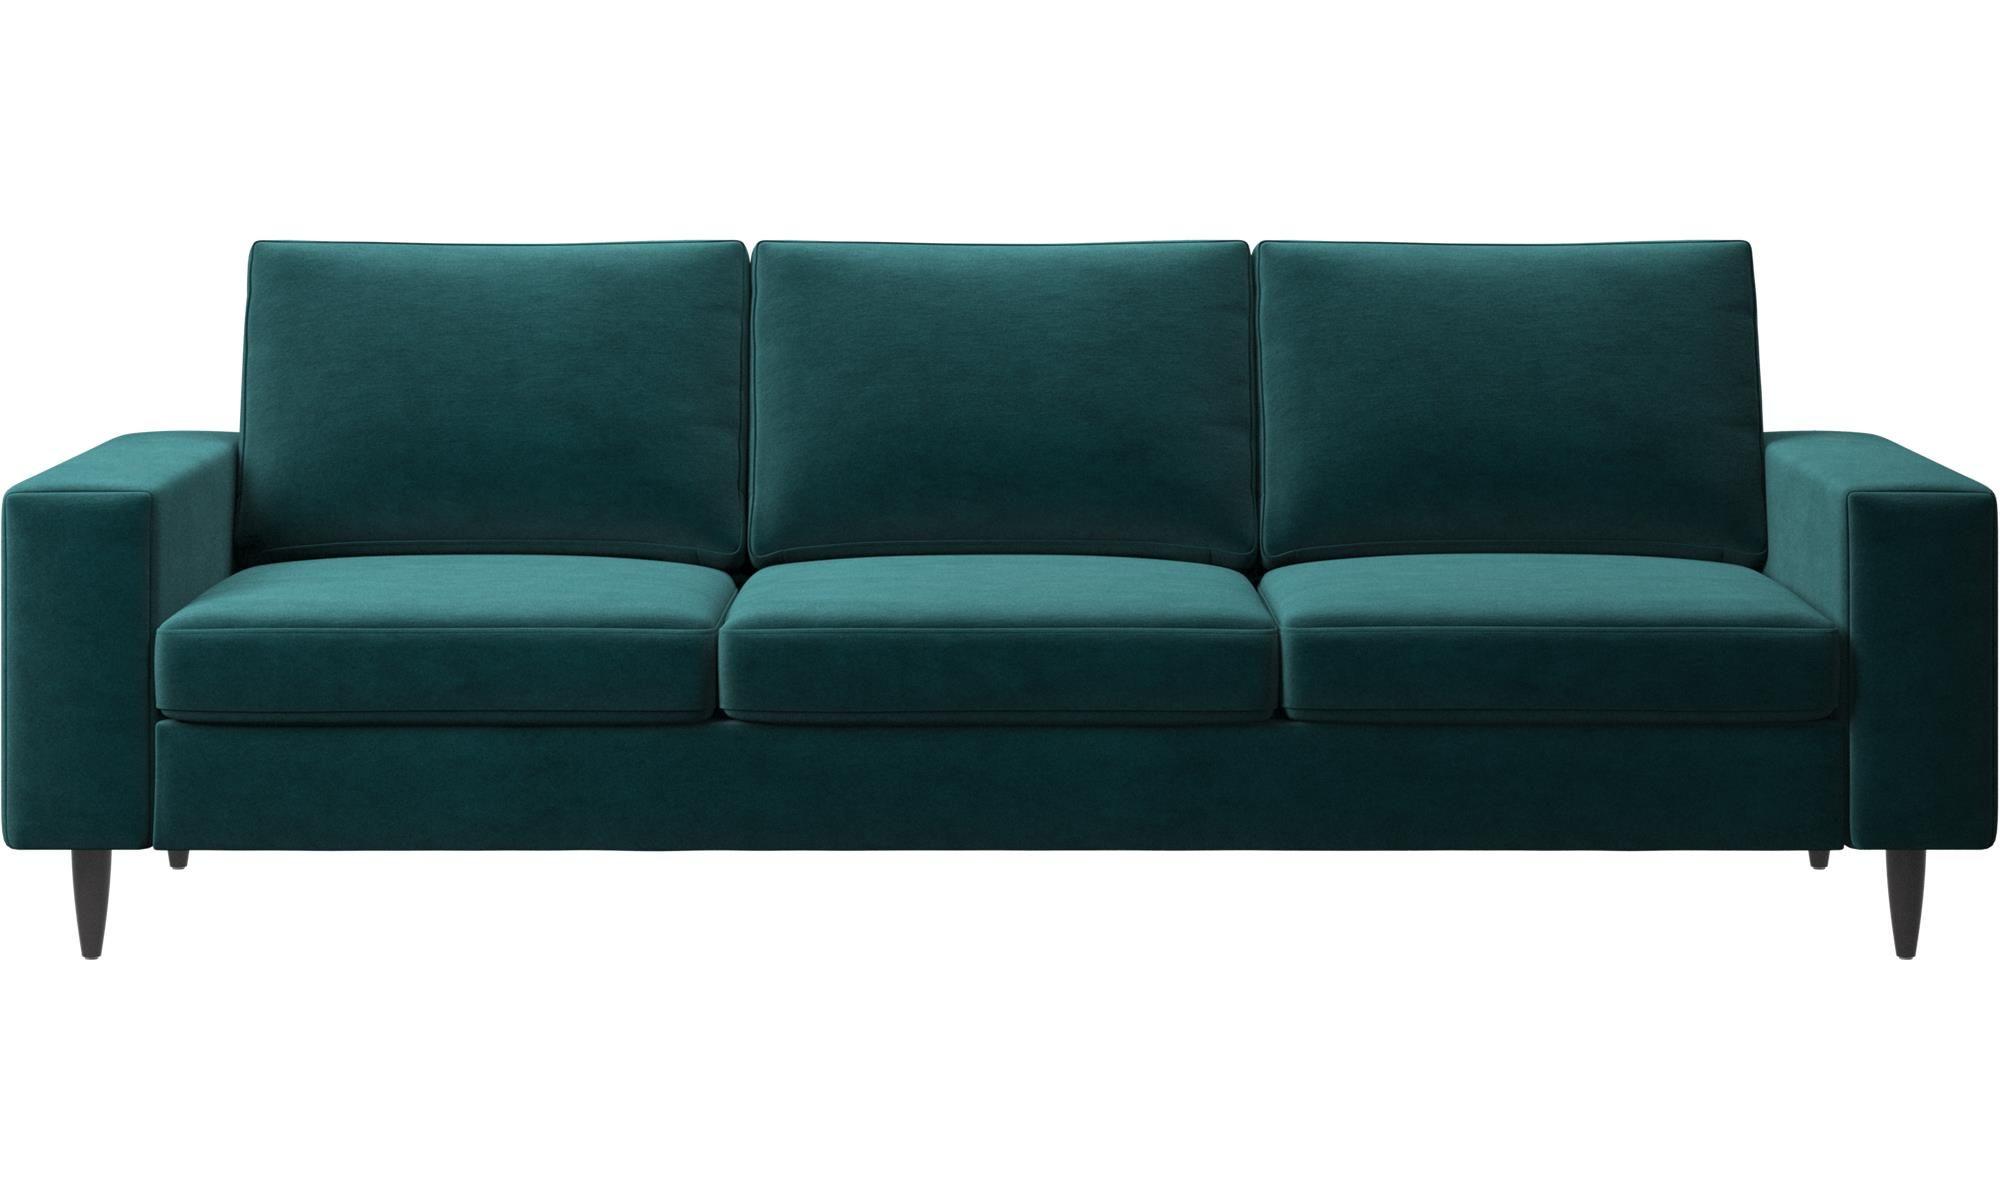 Indivi Sofa 3 Seater Sofa Sofa Grey Lounge